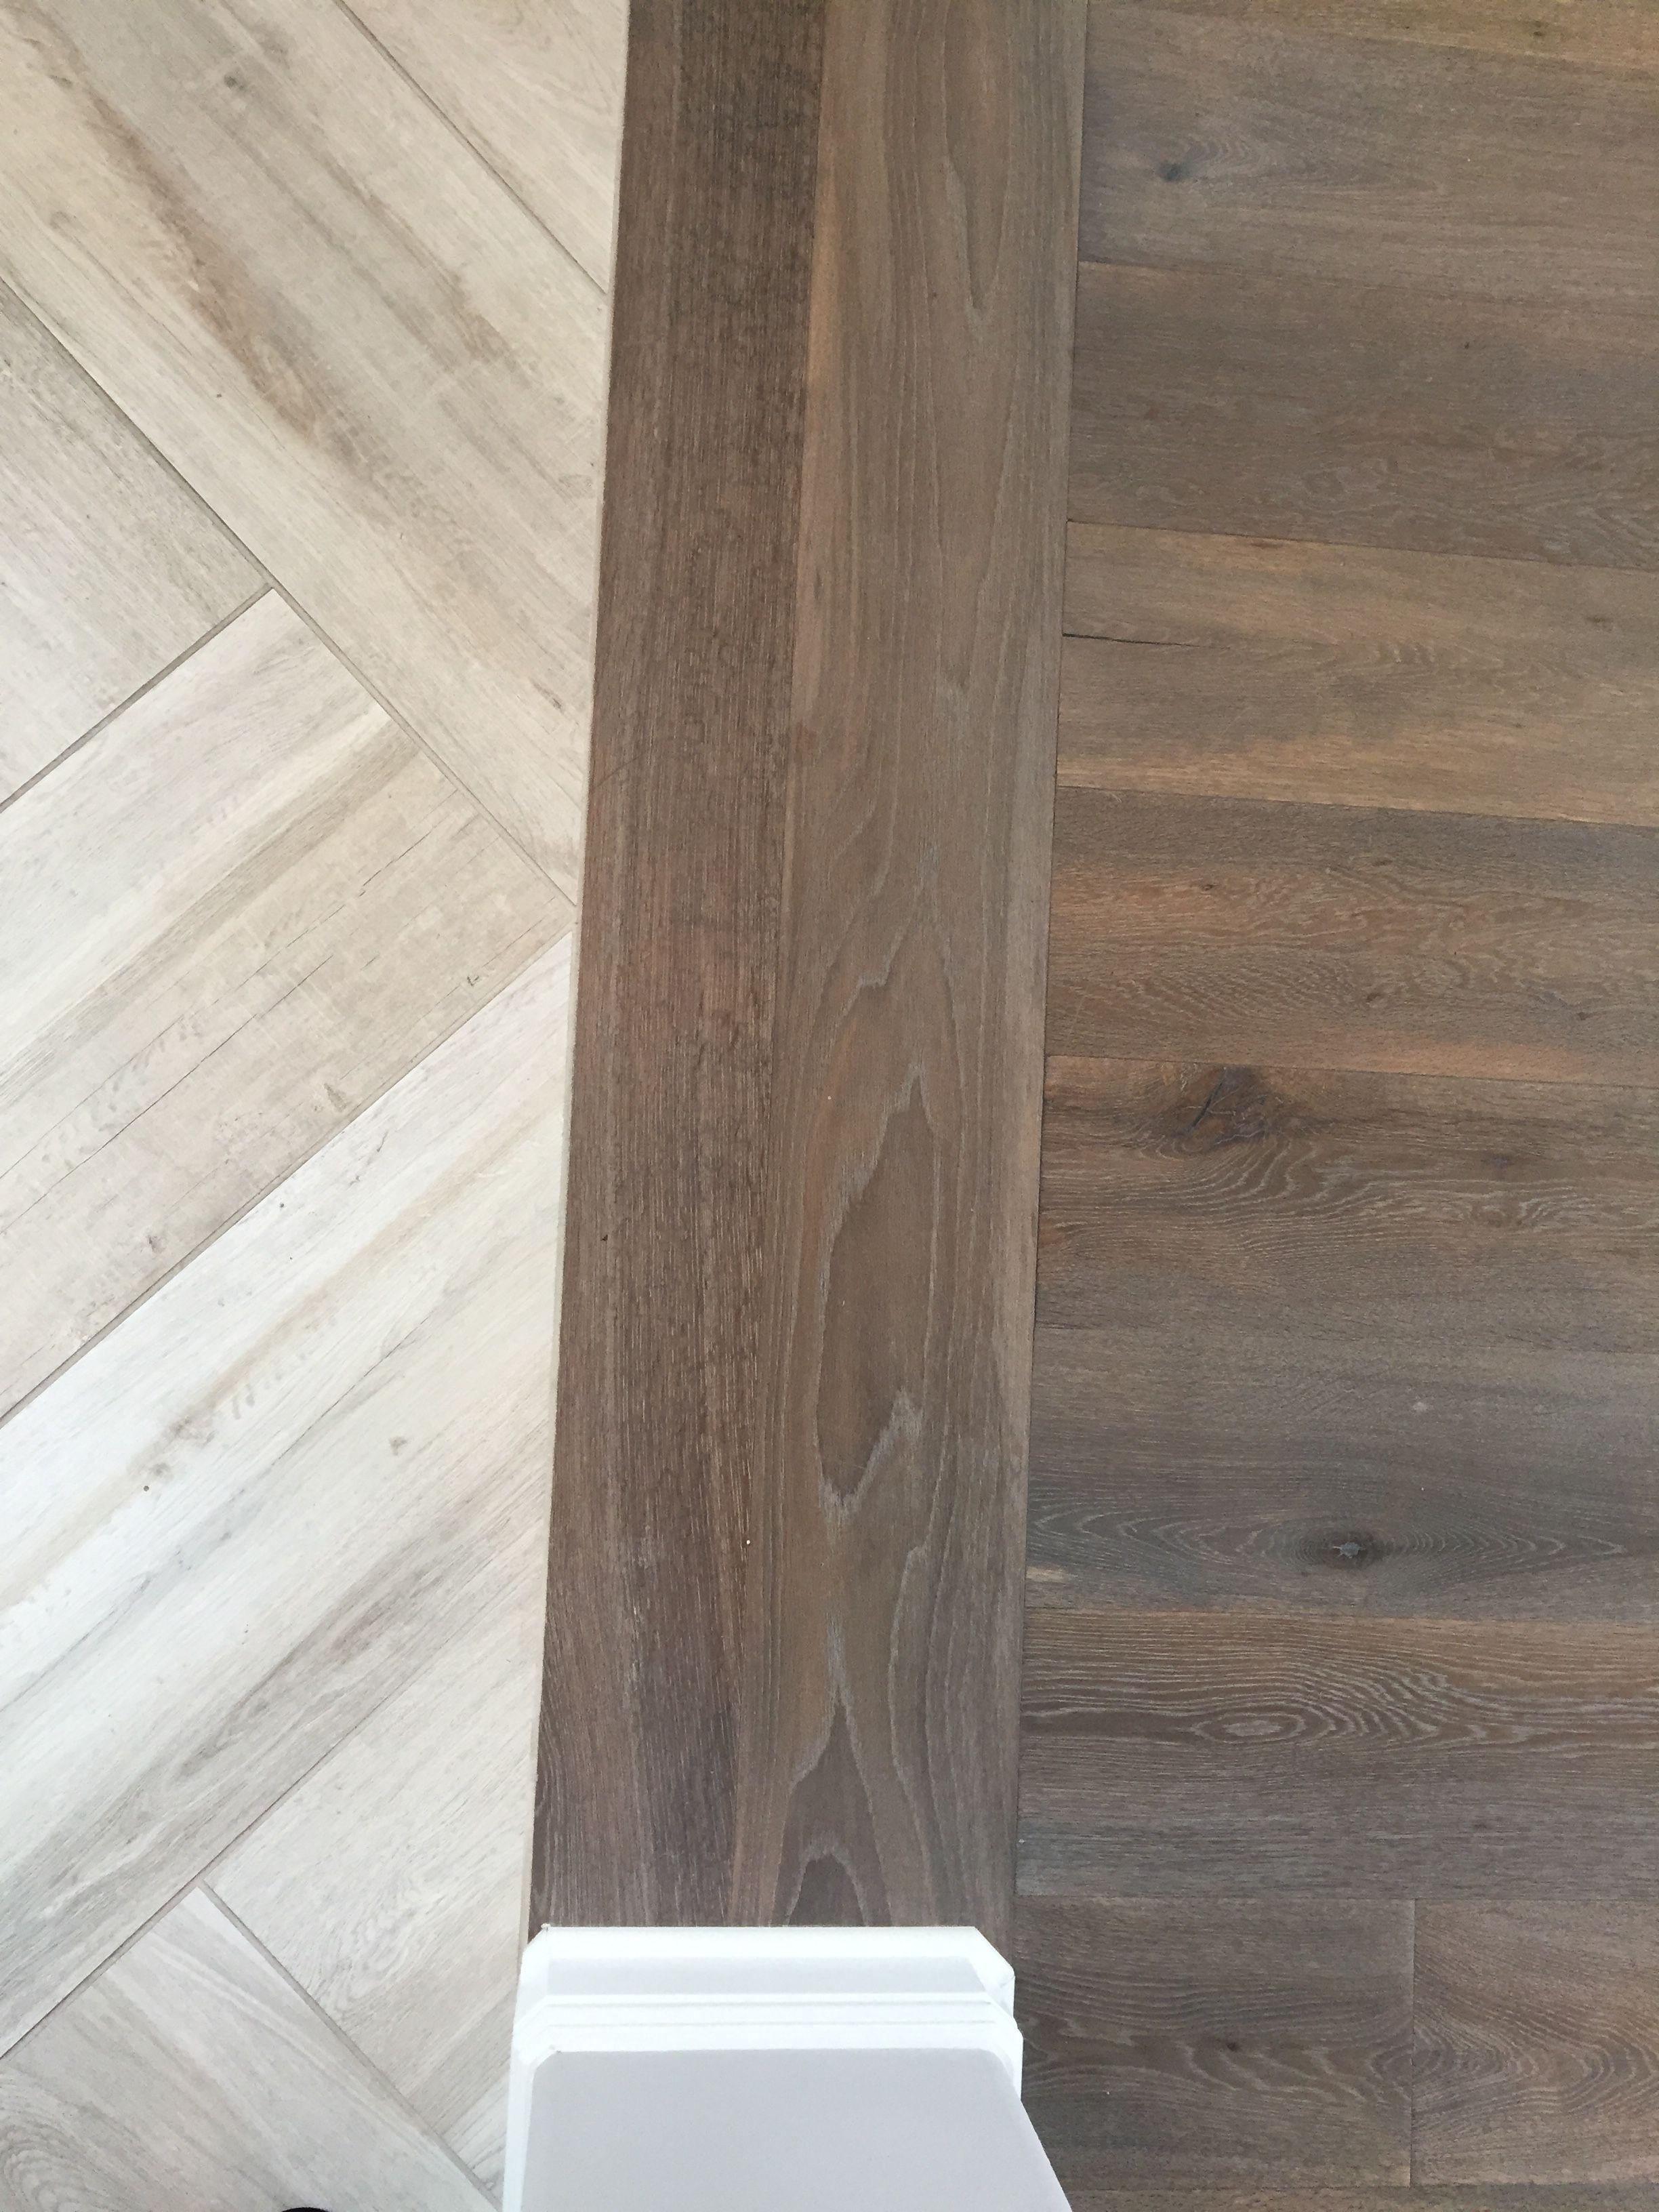 13 Great Hardwood Floor Vs Carpet Price 2021 free download hardwood floor vs carpet price of top 48 awesome carpet tile transition rugs on carpet in carpet tile transition new floor transition laminate to herringbone tile pattern of carpet tile tran